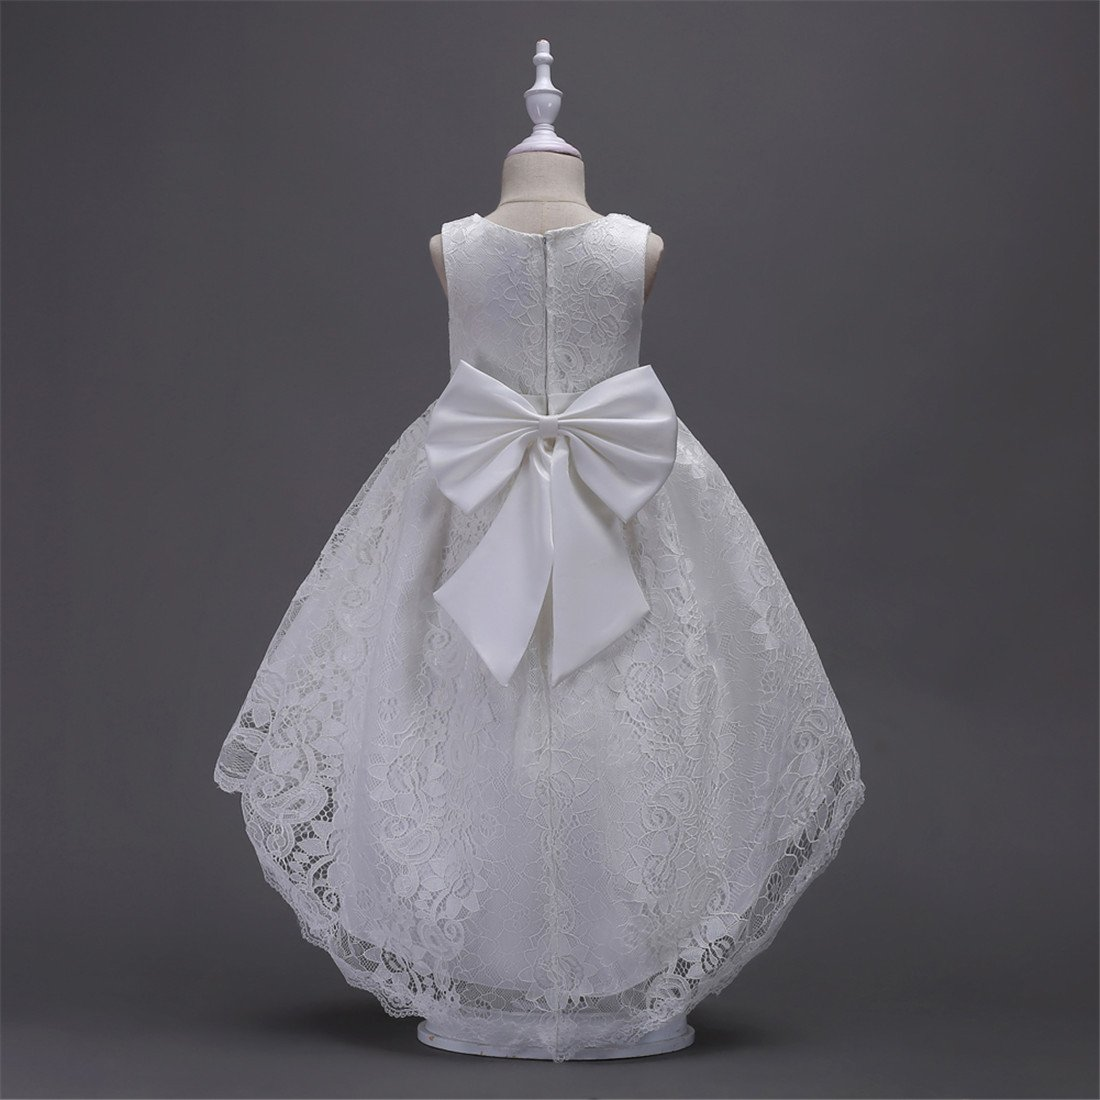 FKKFYY 2-14 Years Girl Wedding Party Graduation Long Tail Tutu Dresses FKKFYY32SD4S